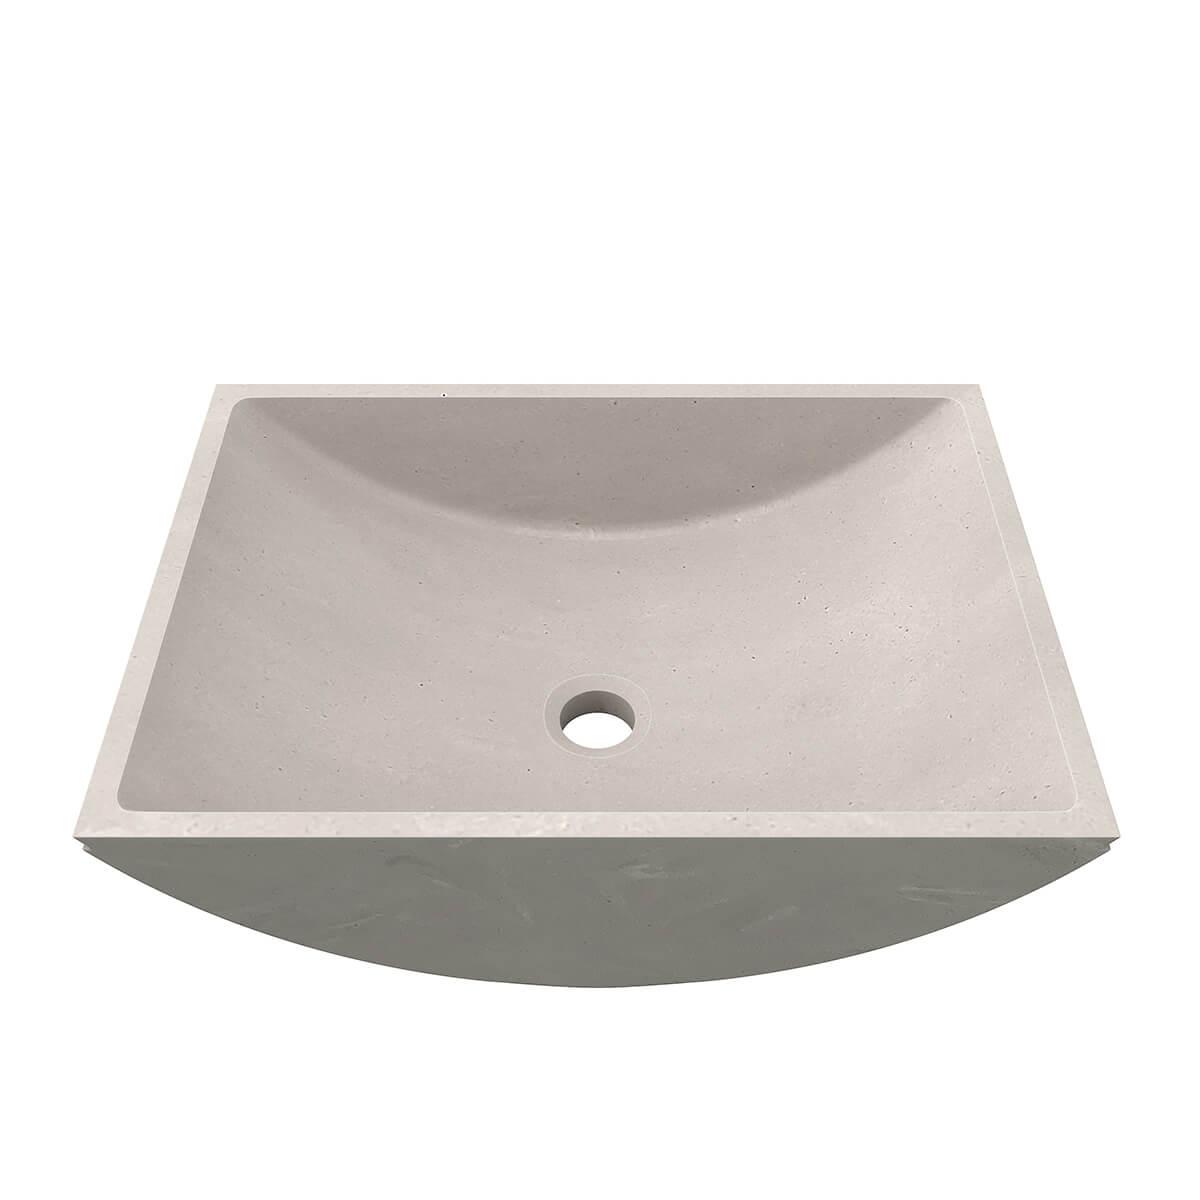 CASF Corian basin refresh 8410 neutral concrete front view